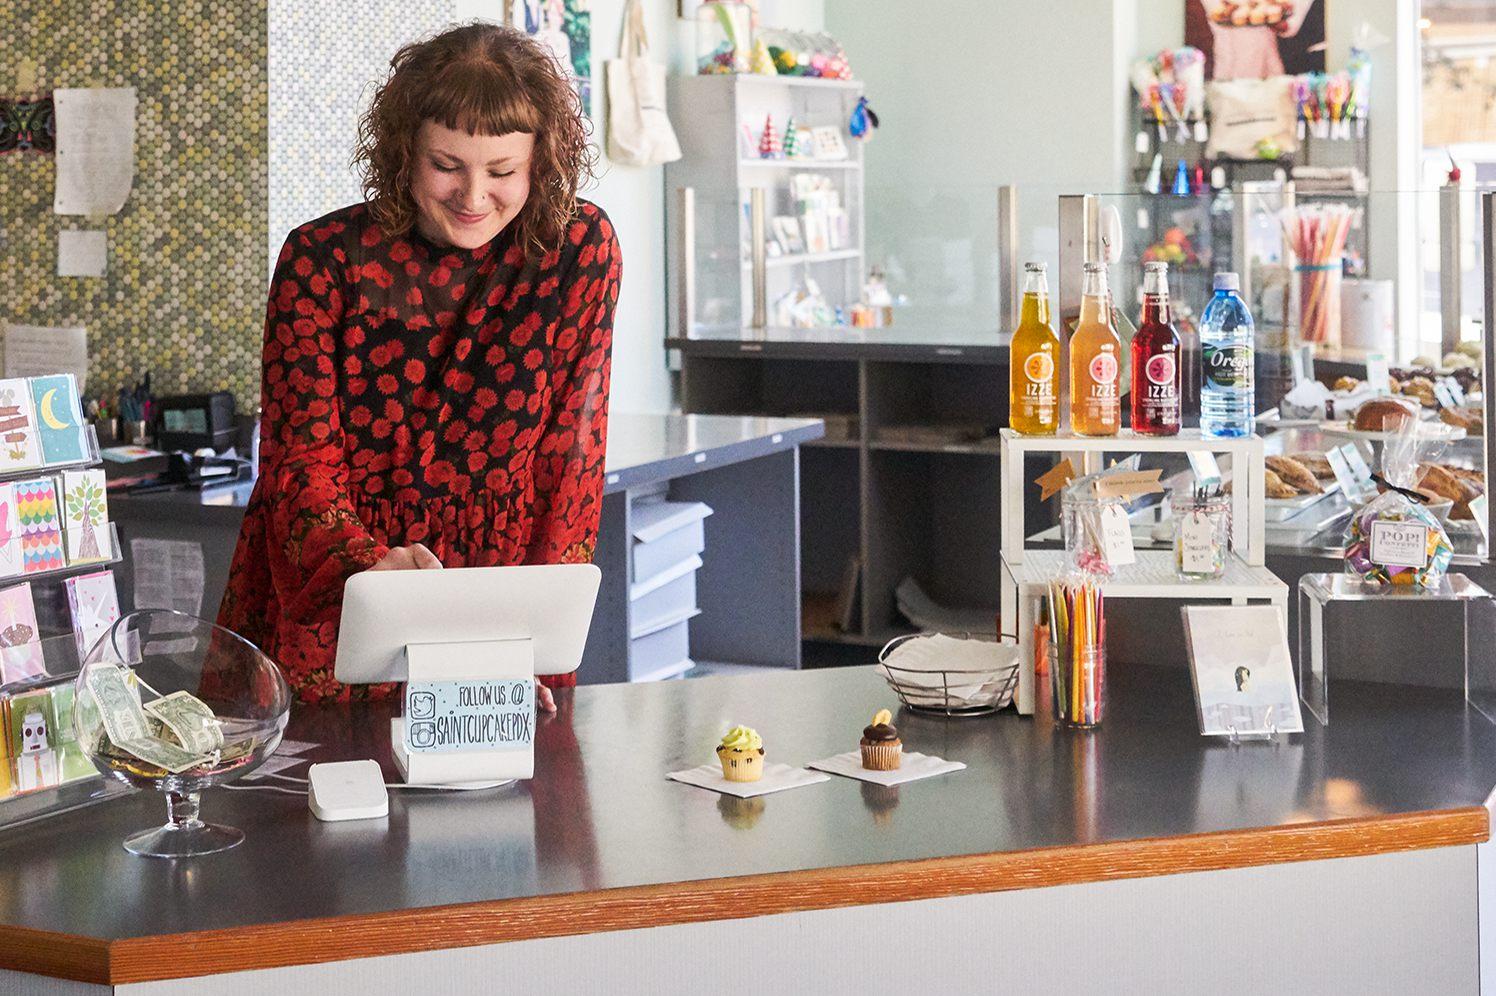 woman-at-bakery-counter